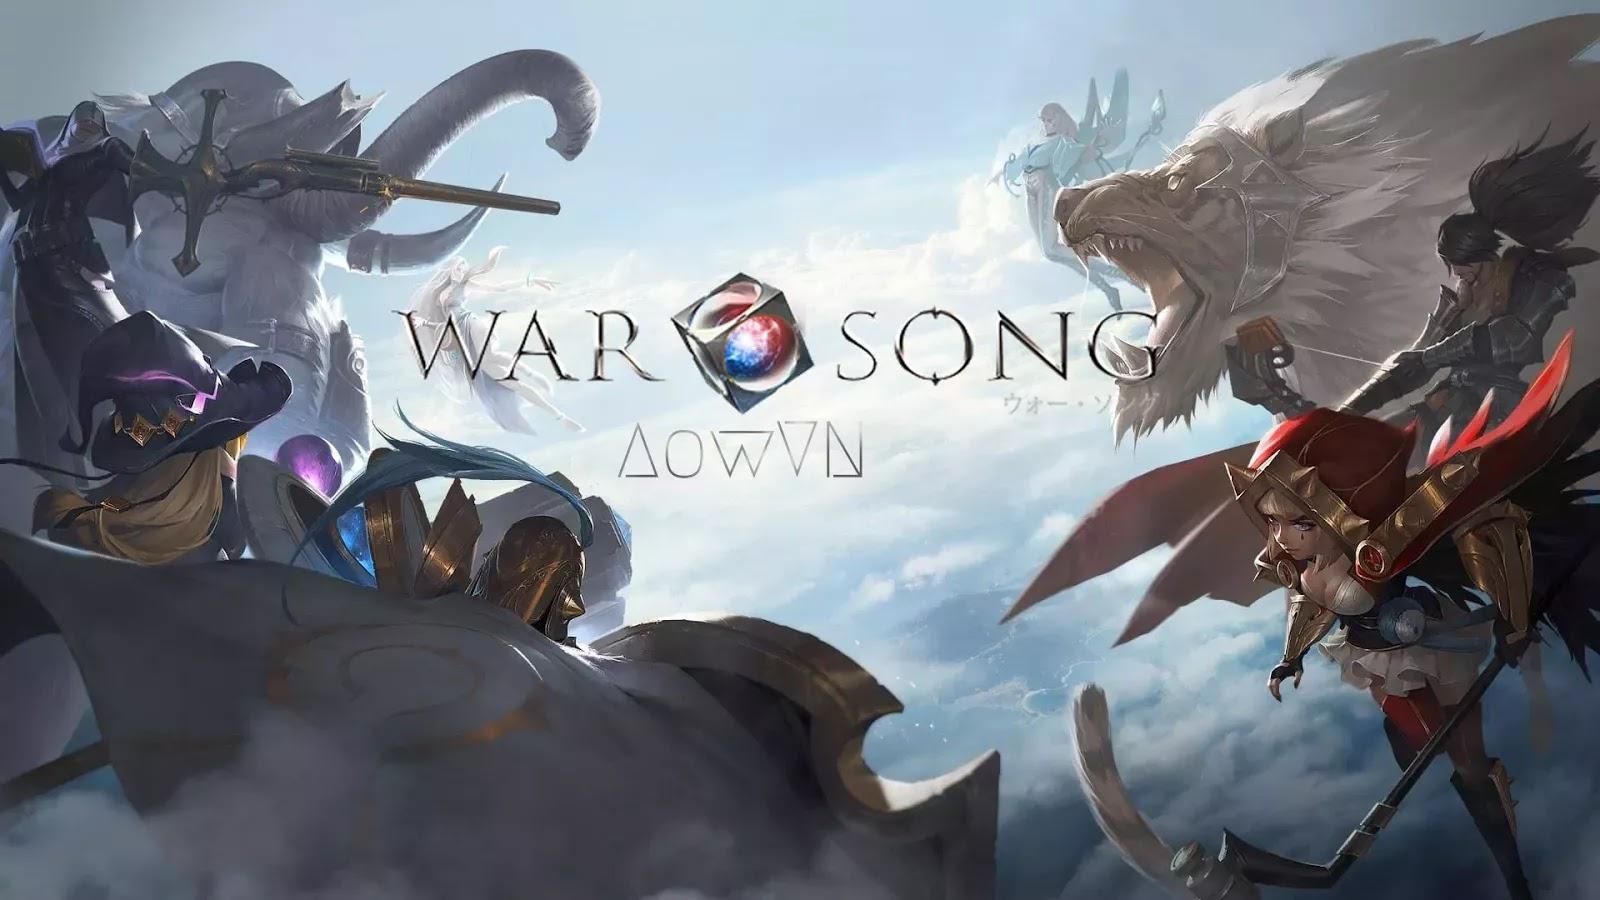 AowVN.org min WarSong%2B%252810%2529 - War Song - Thông Tin Về Game - Game Info